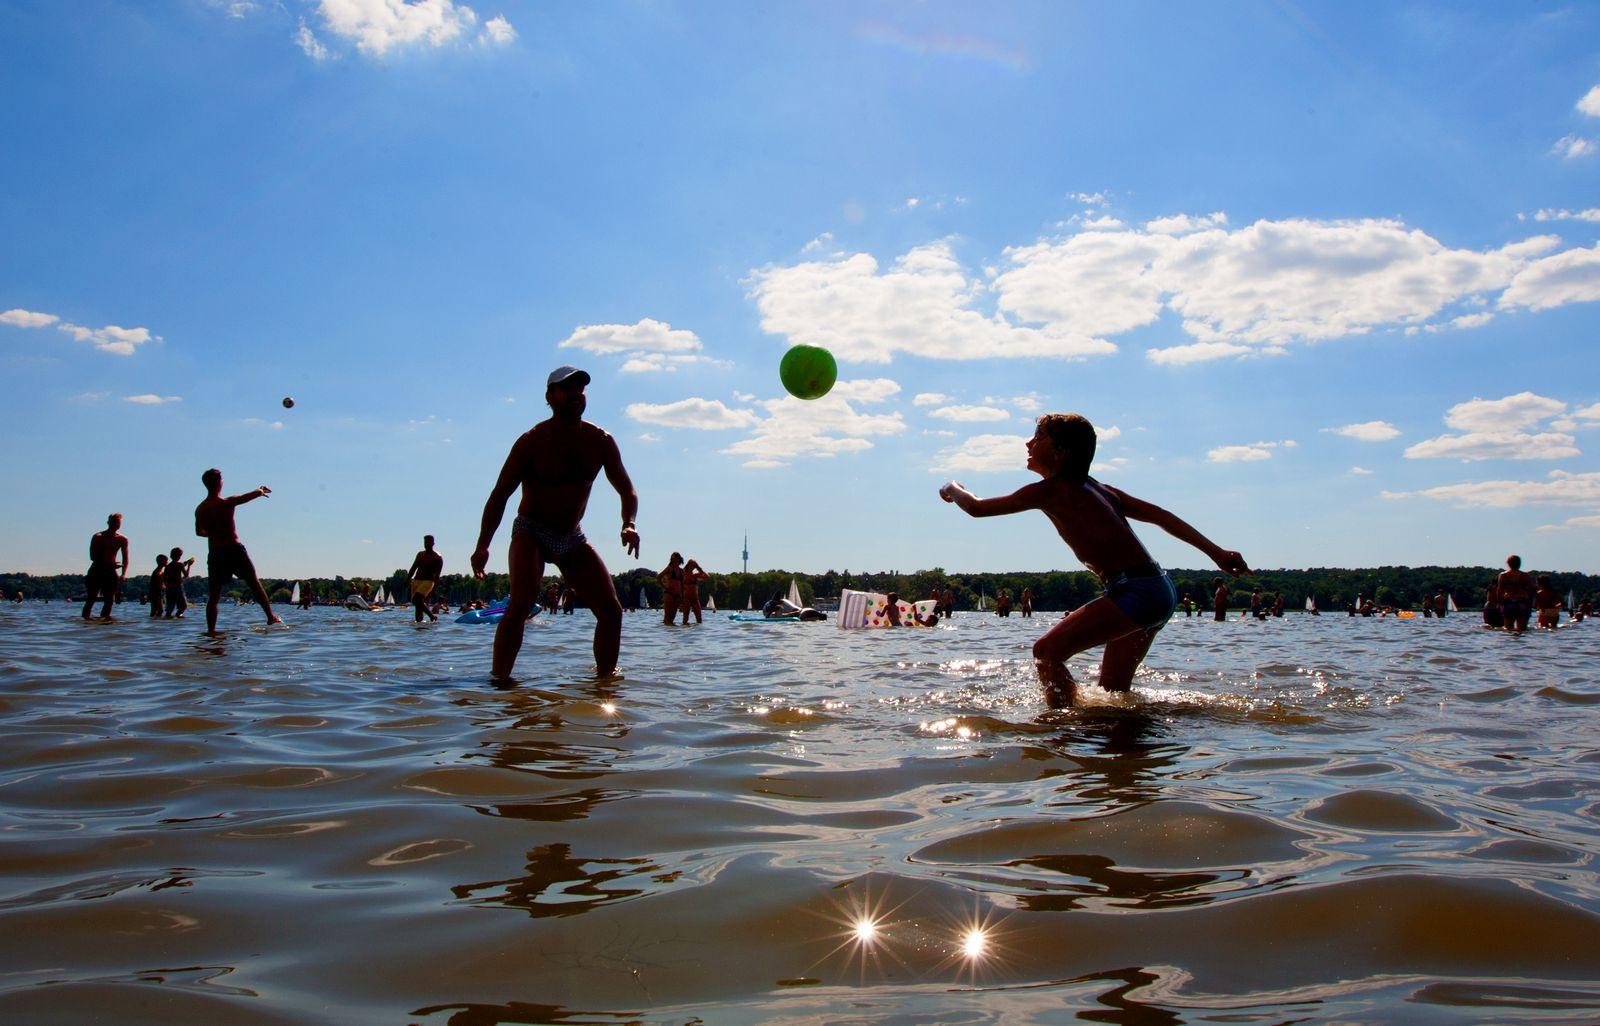 Am Wannsee / Urlaub / Familienurlaub